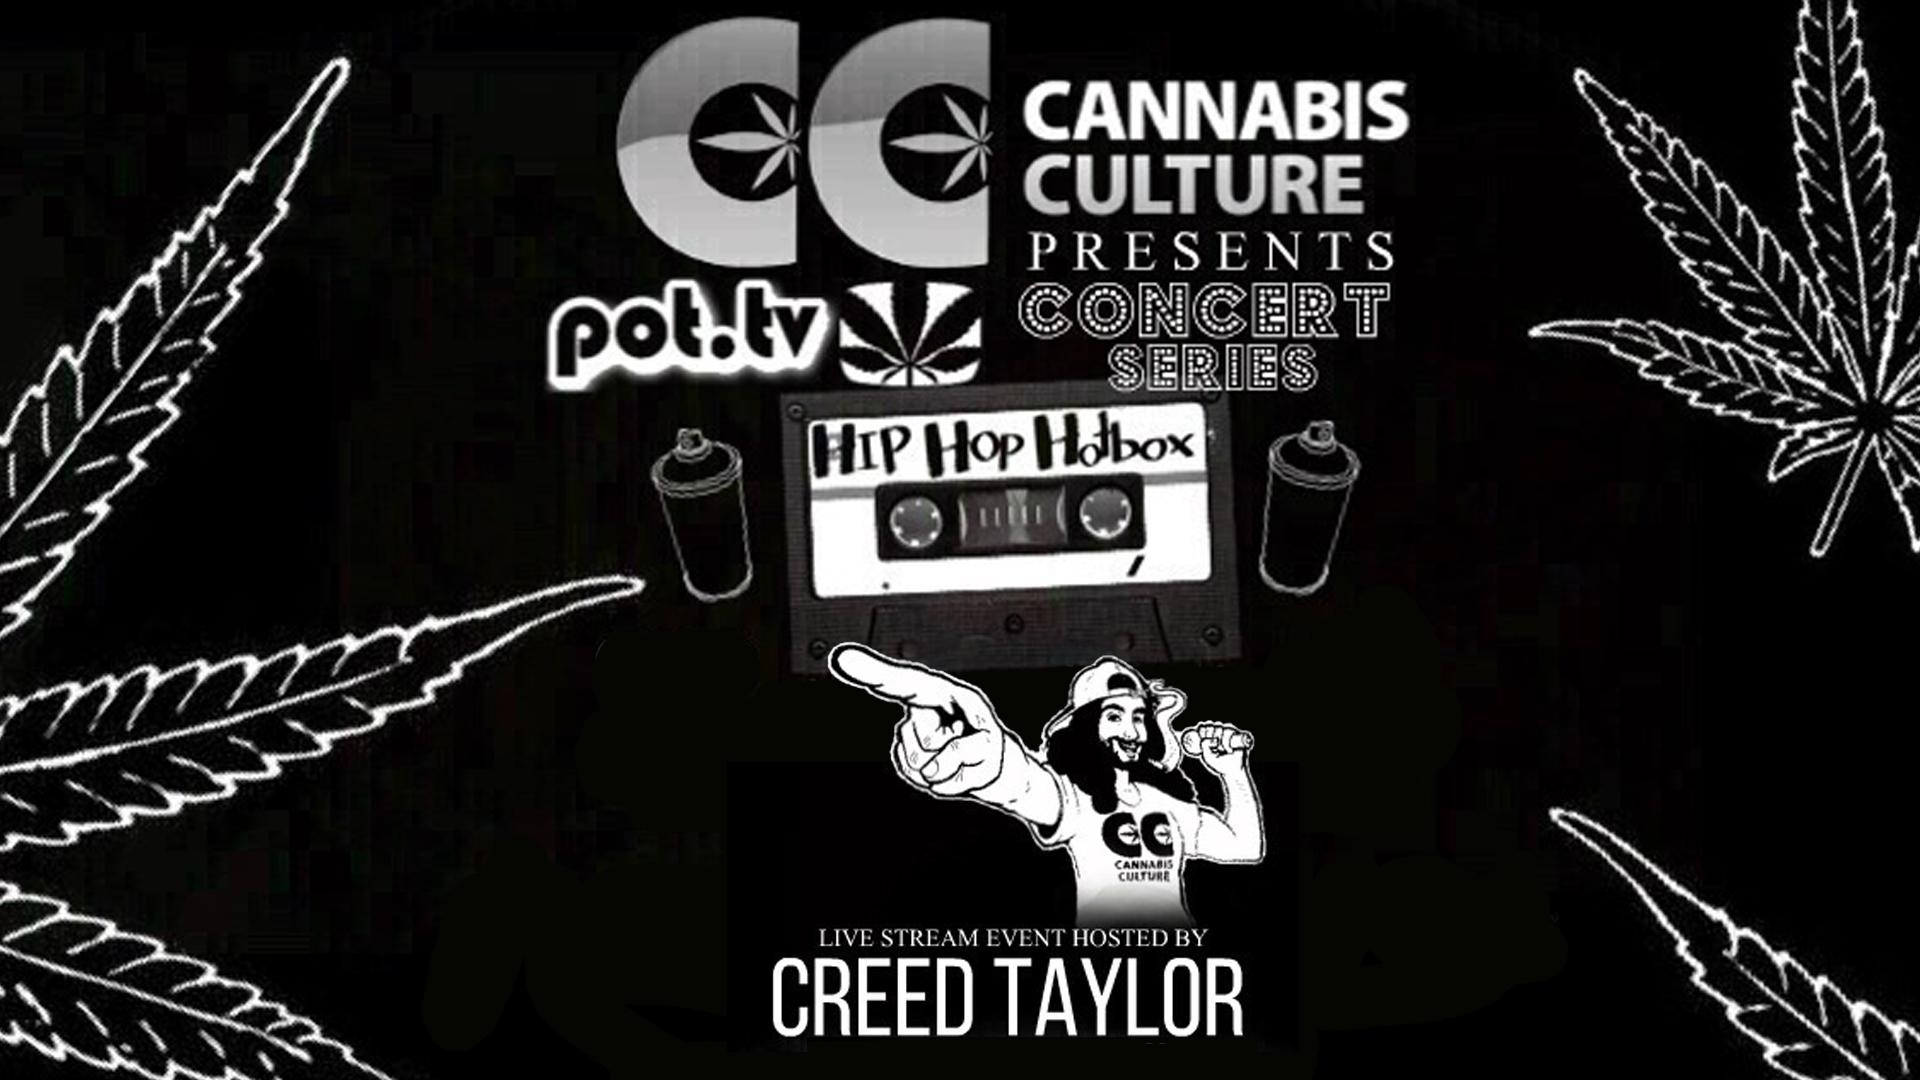 hip-hop-hotbox-creed-taylor